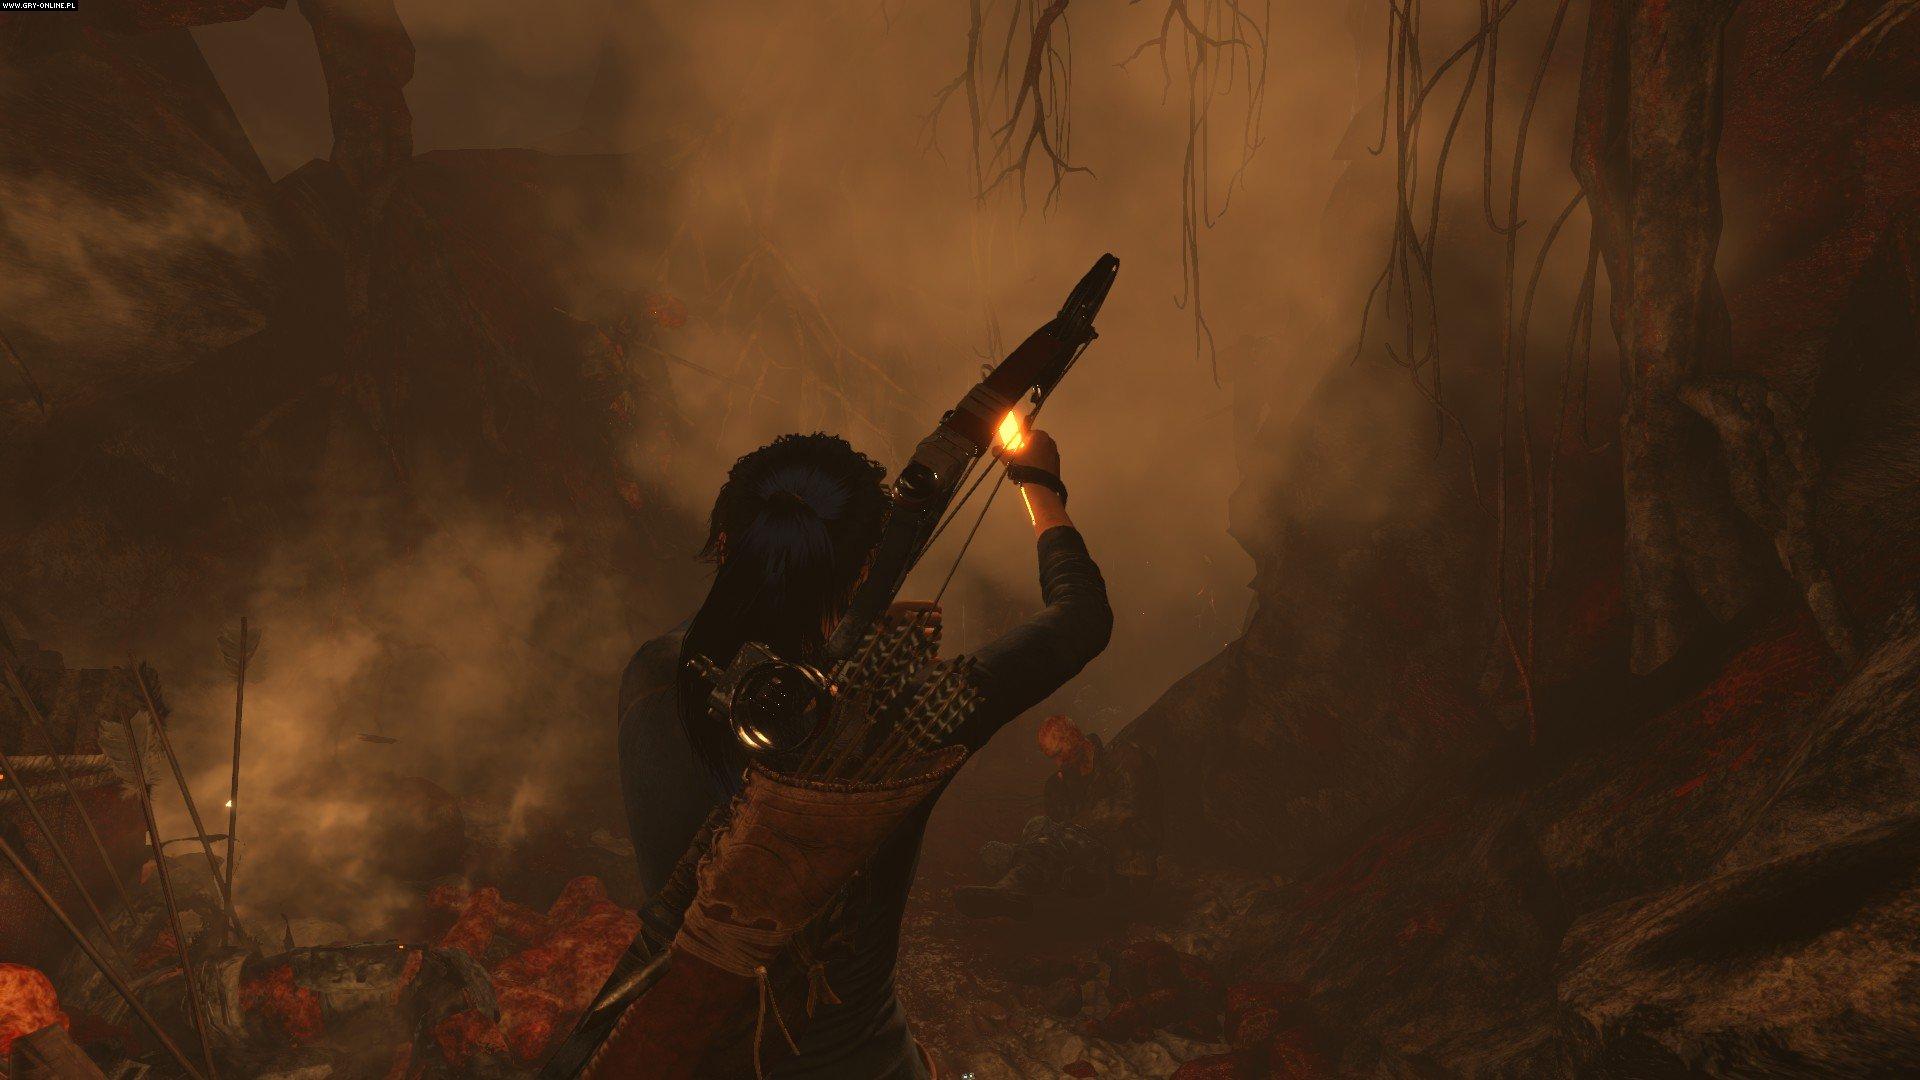 Rise of the Tomb Raider PC, XONE Games Image 38/126, Crystal Dynamics, Square-Enix / Eidos